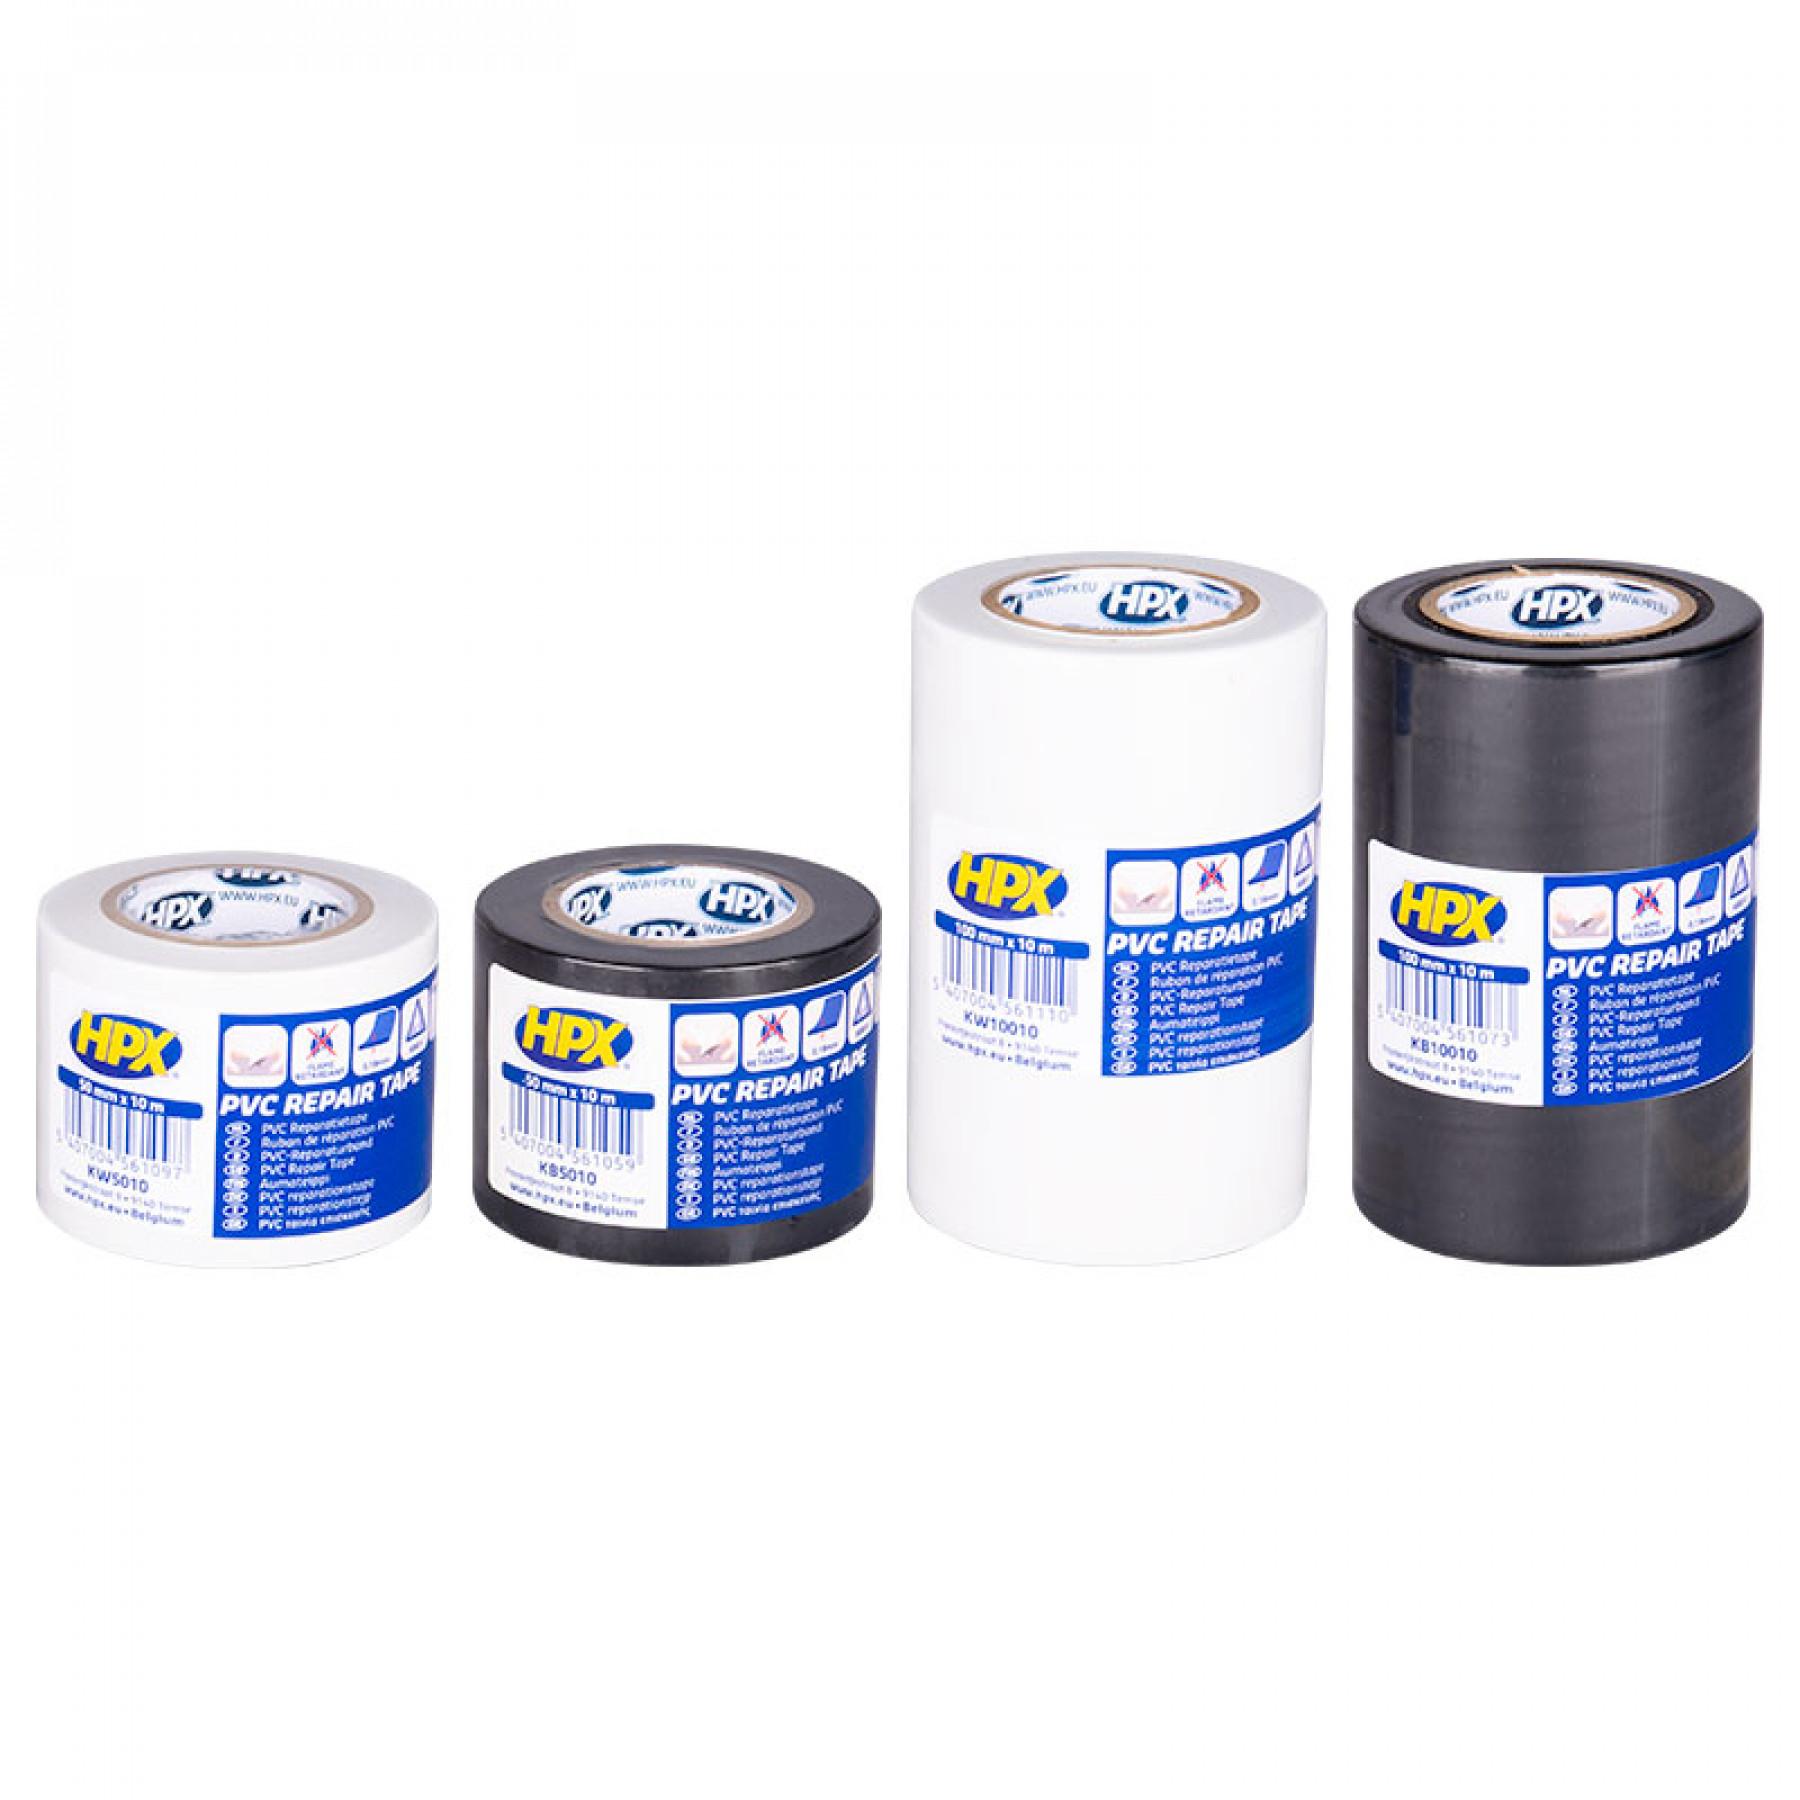 Isolatie tape 5cm x 10 mtr. zwart